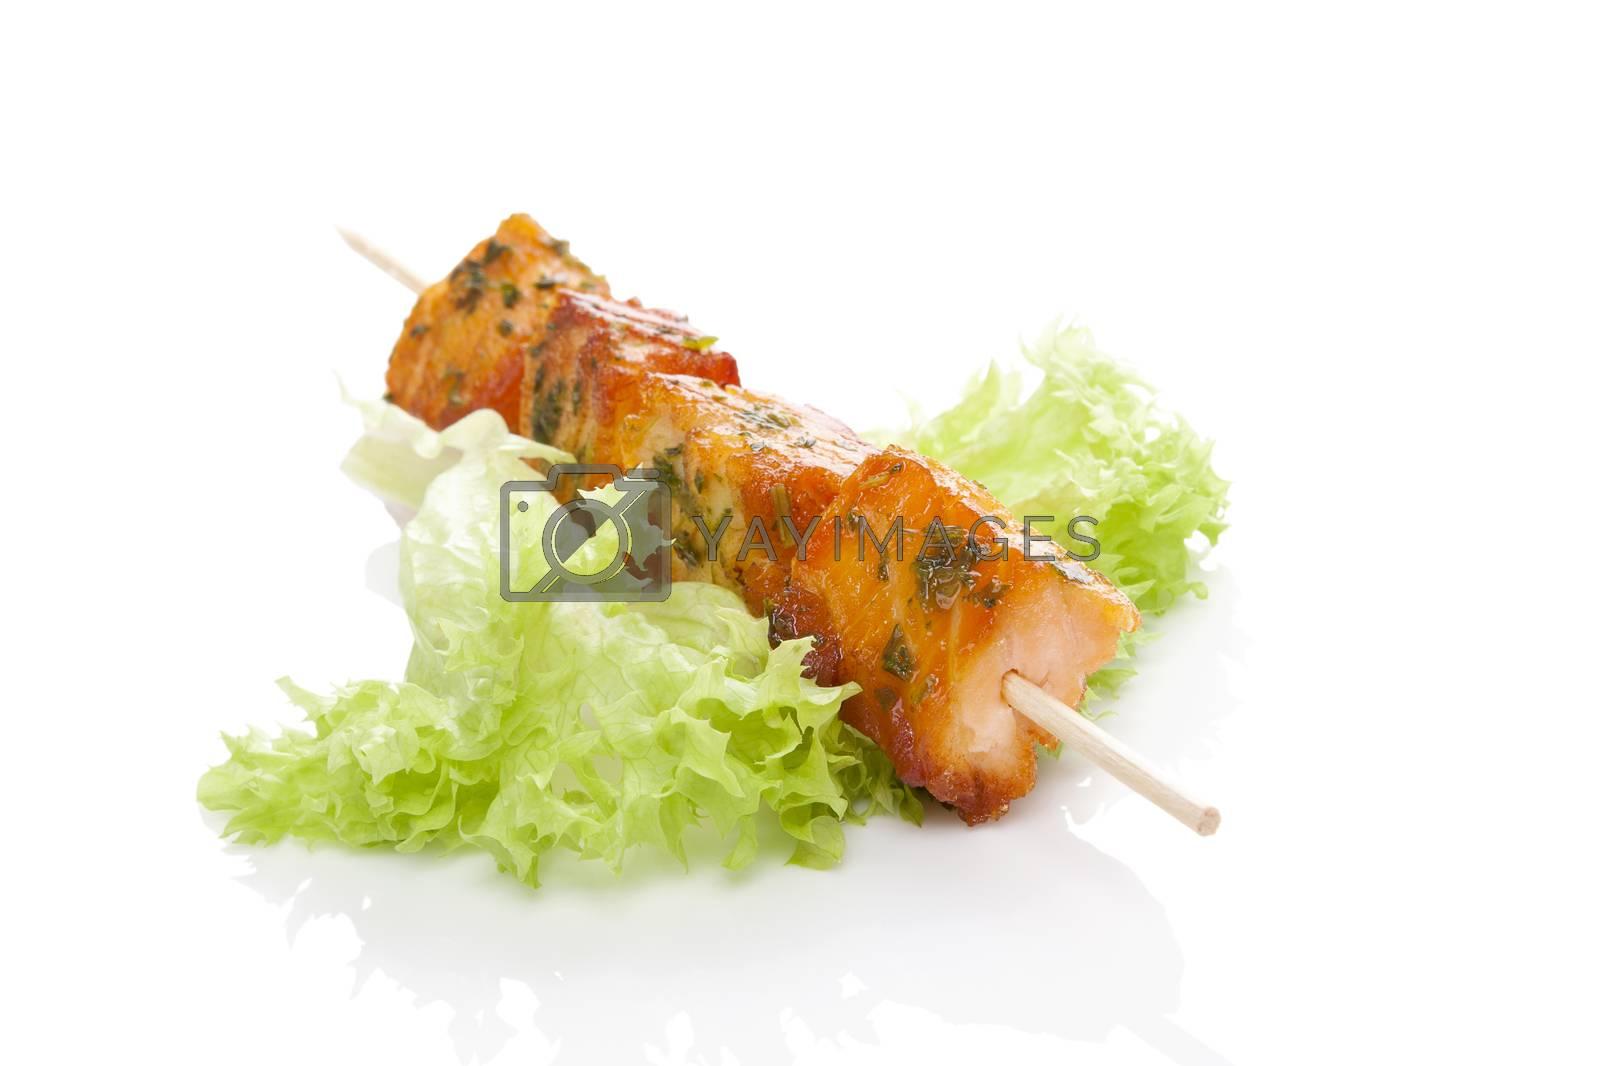 Salmon kebab and green salad. by eskymaks